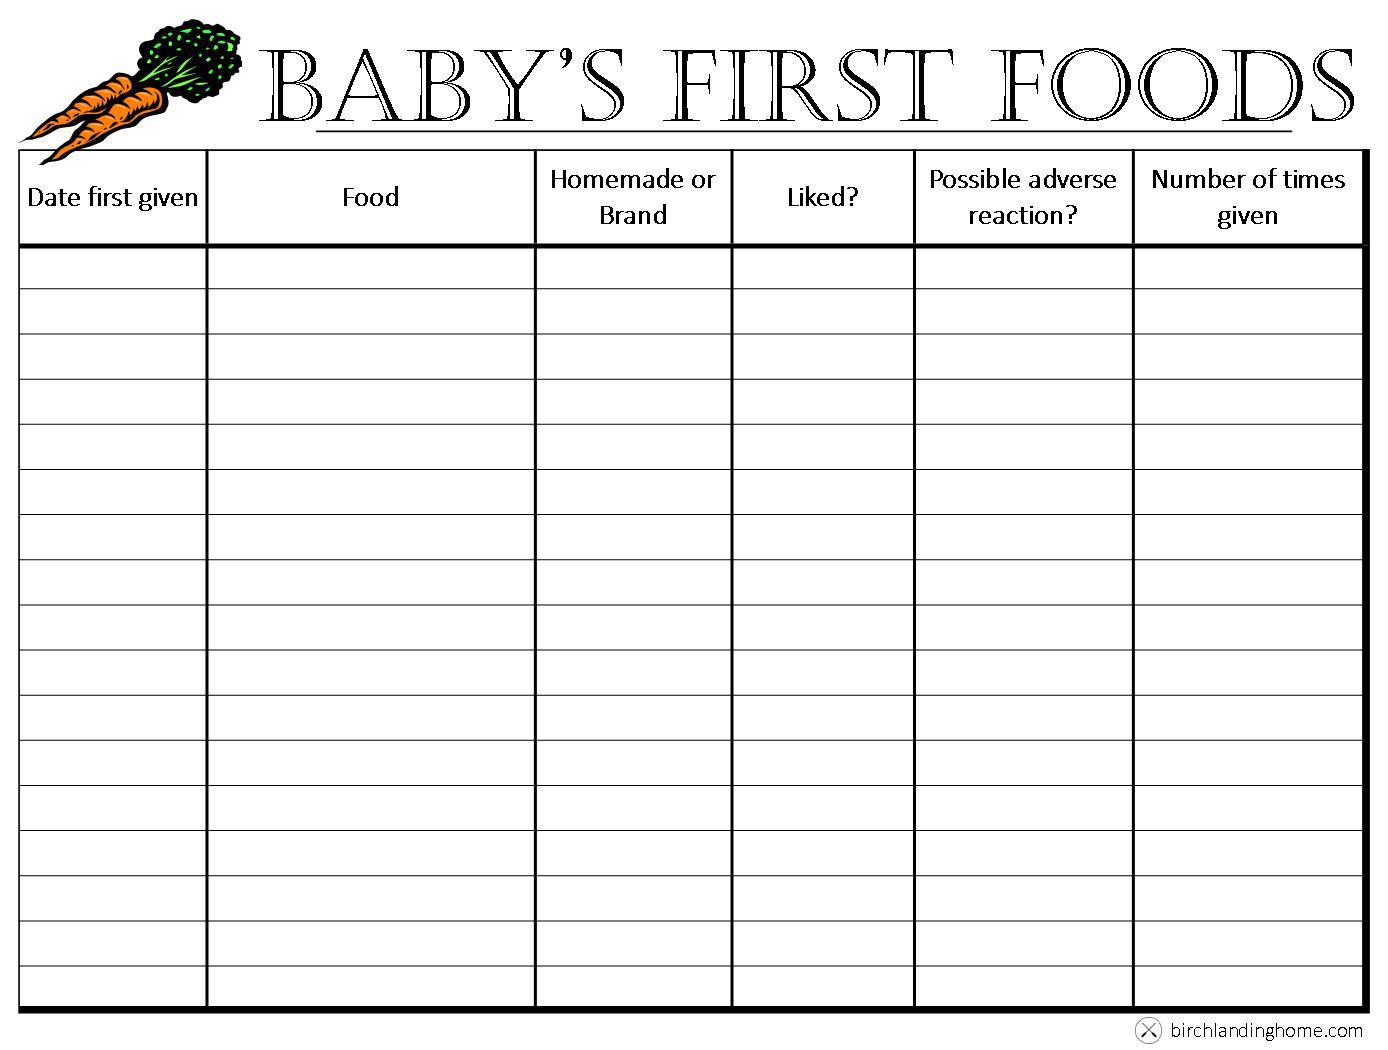 Baby\u0027s First Foods The Basics {Free Printable Chart} \u2014Blog - Birch